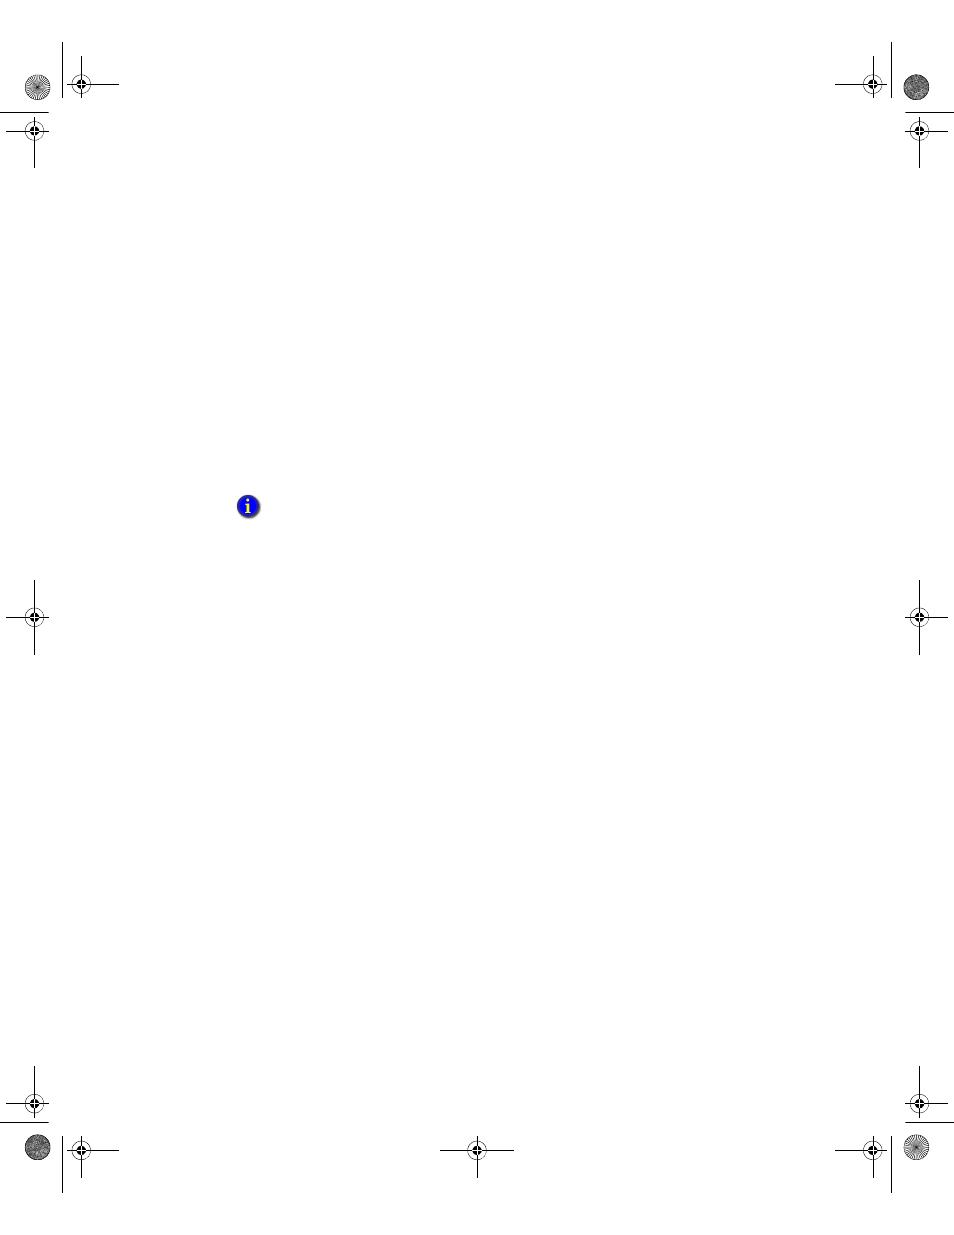 Factorytalk activation, Connectivity, Rslinx enterprise | Rockwell